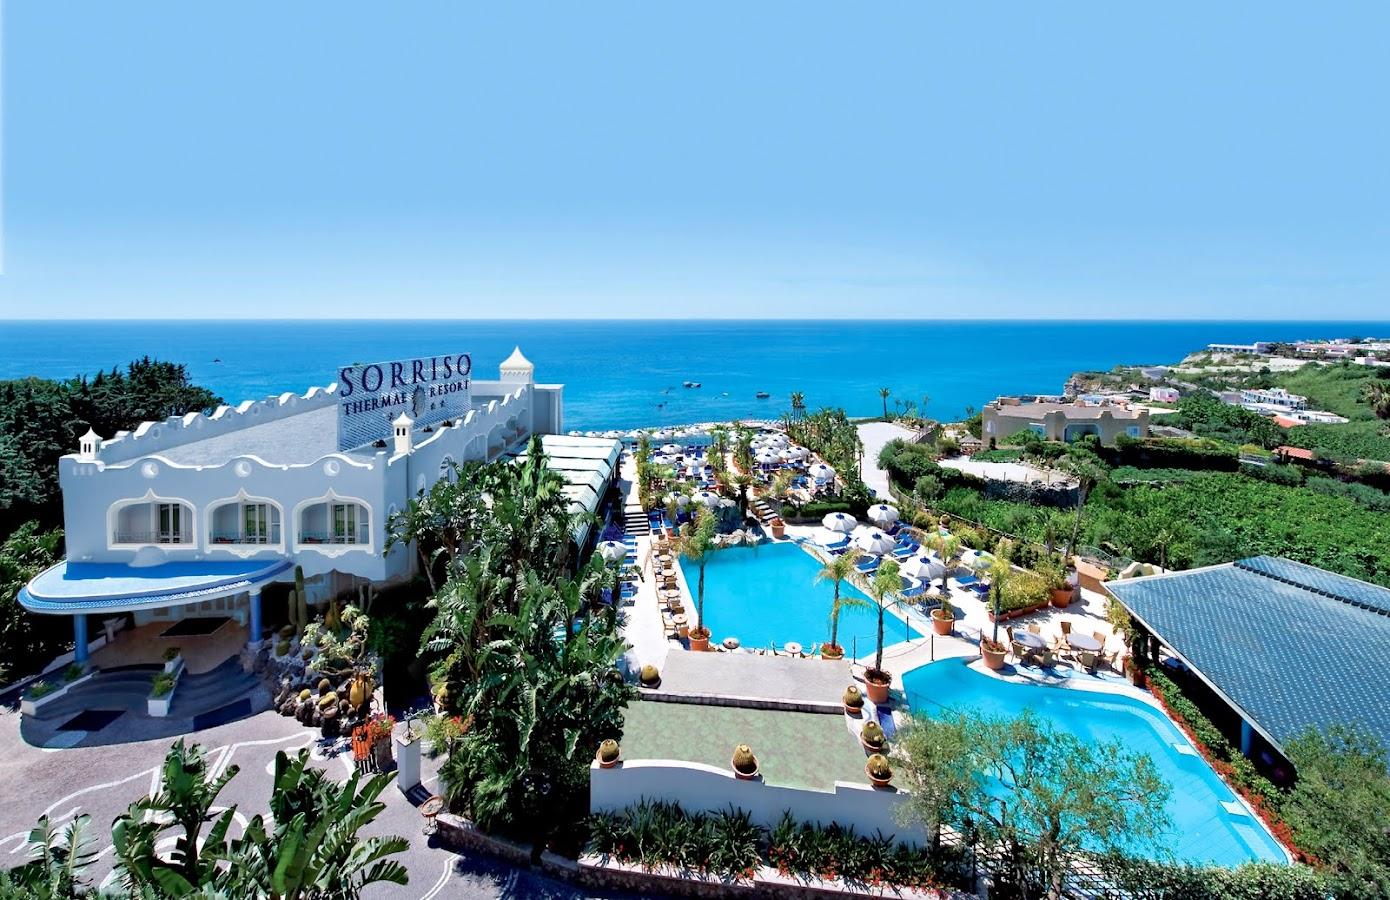 Sorriso Thermae Resort e SPA - Isola d'Ischia